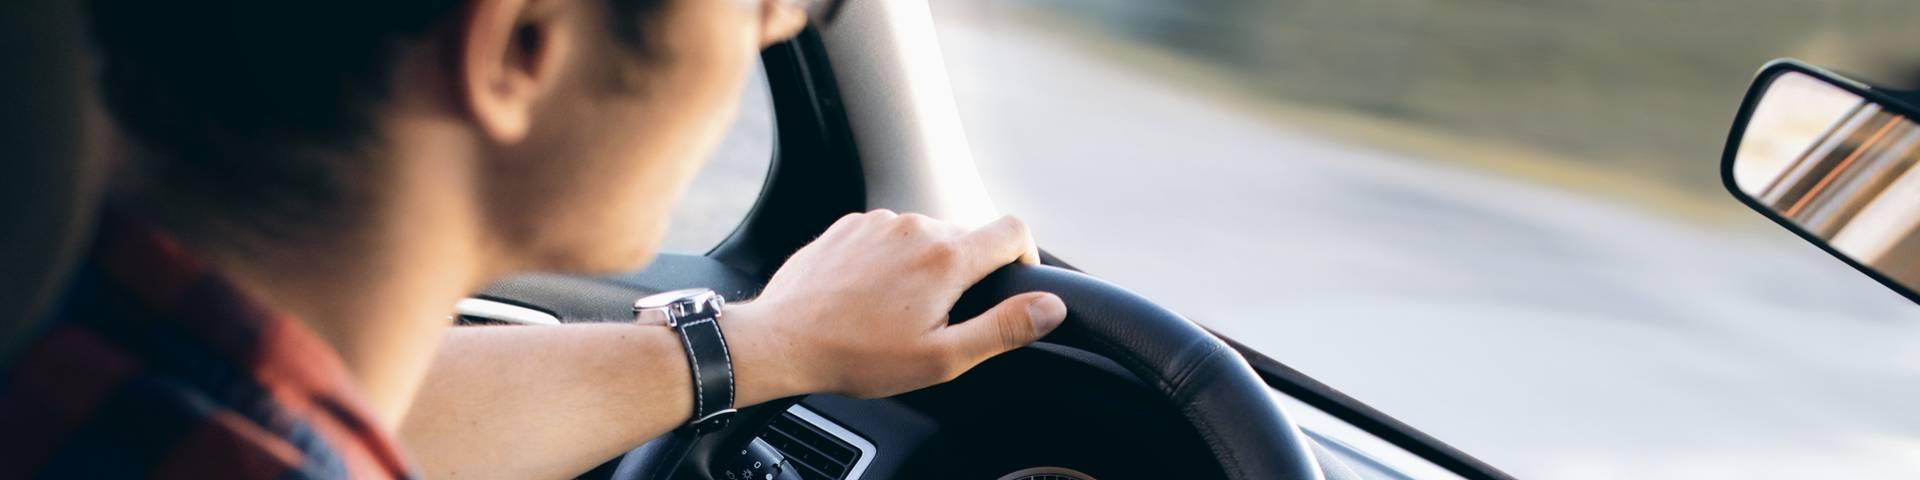 Conduite en voiture